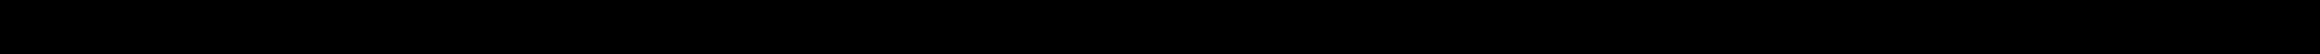 DENSO 5269556, MS851571, MS851622, 900415-1170, 90048-51154A Sytytystulppa